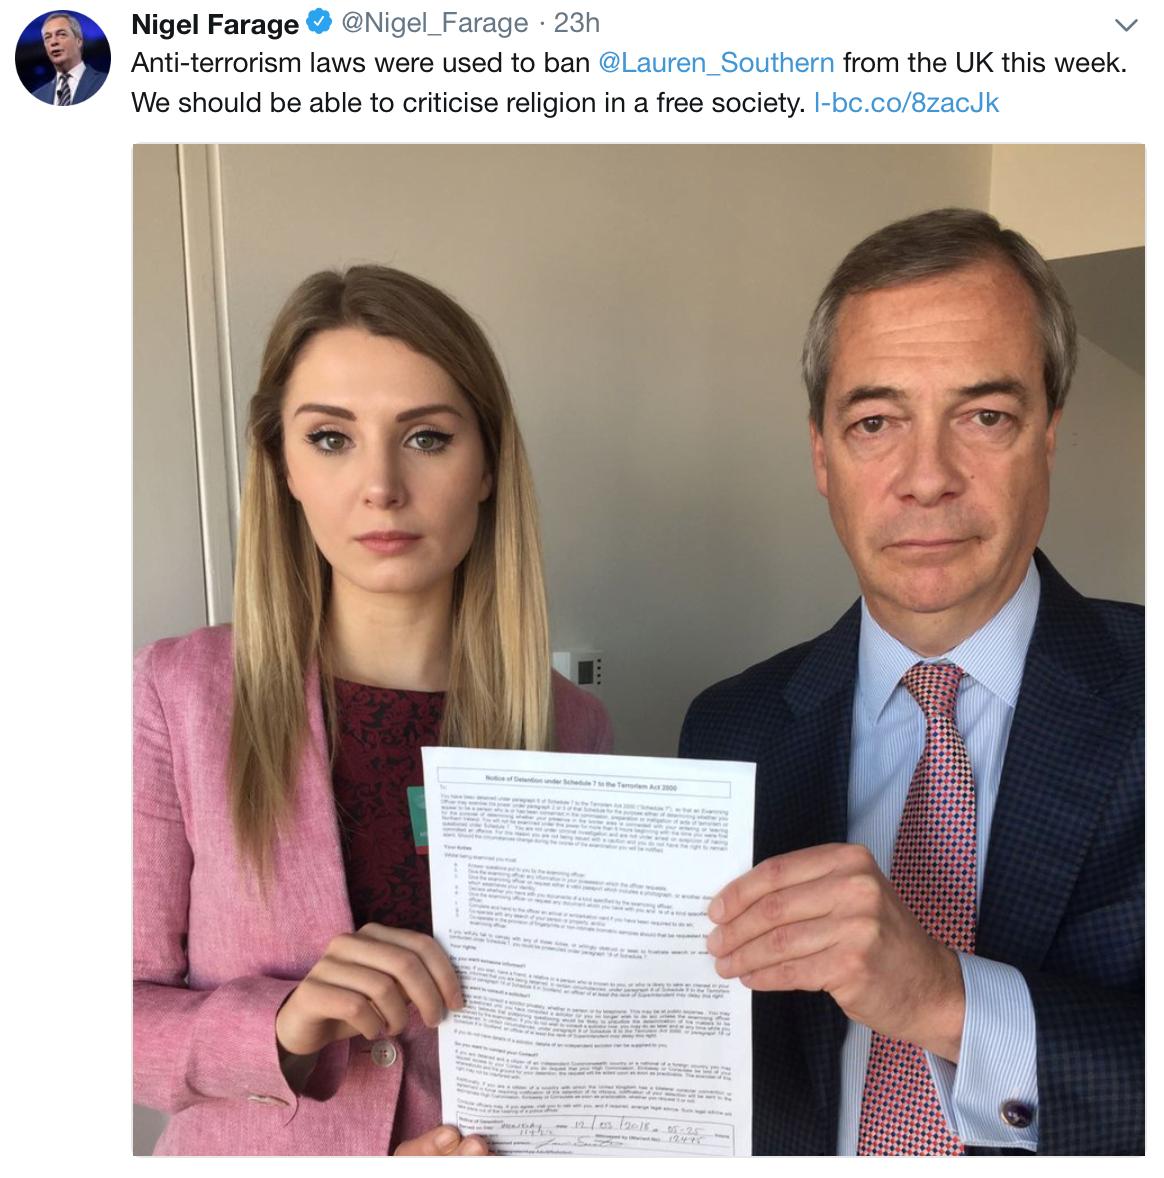 Farage tweet.png